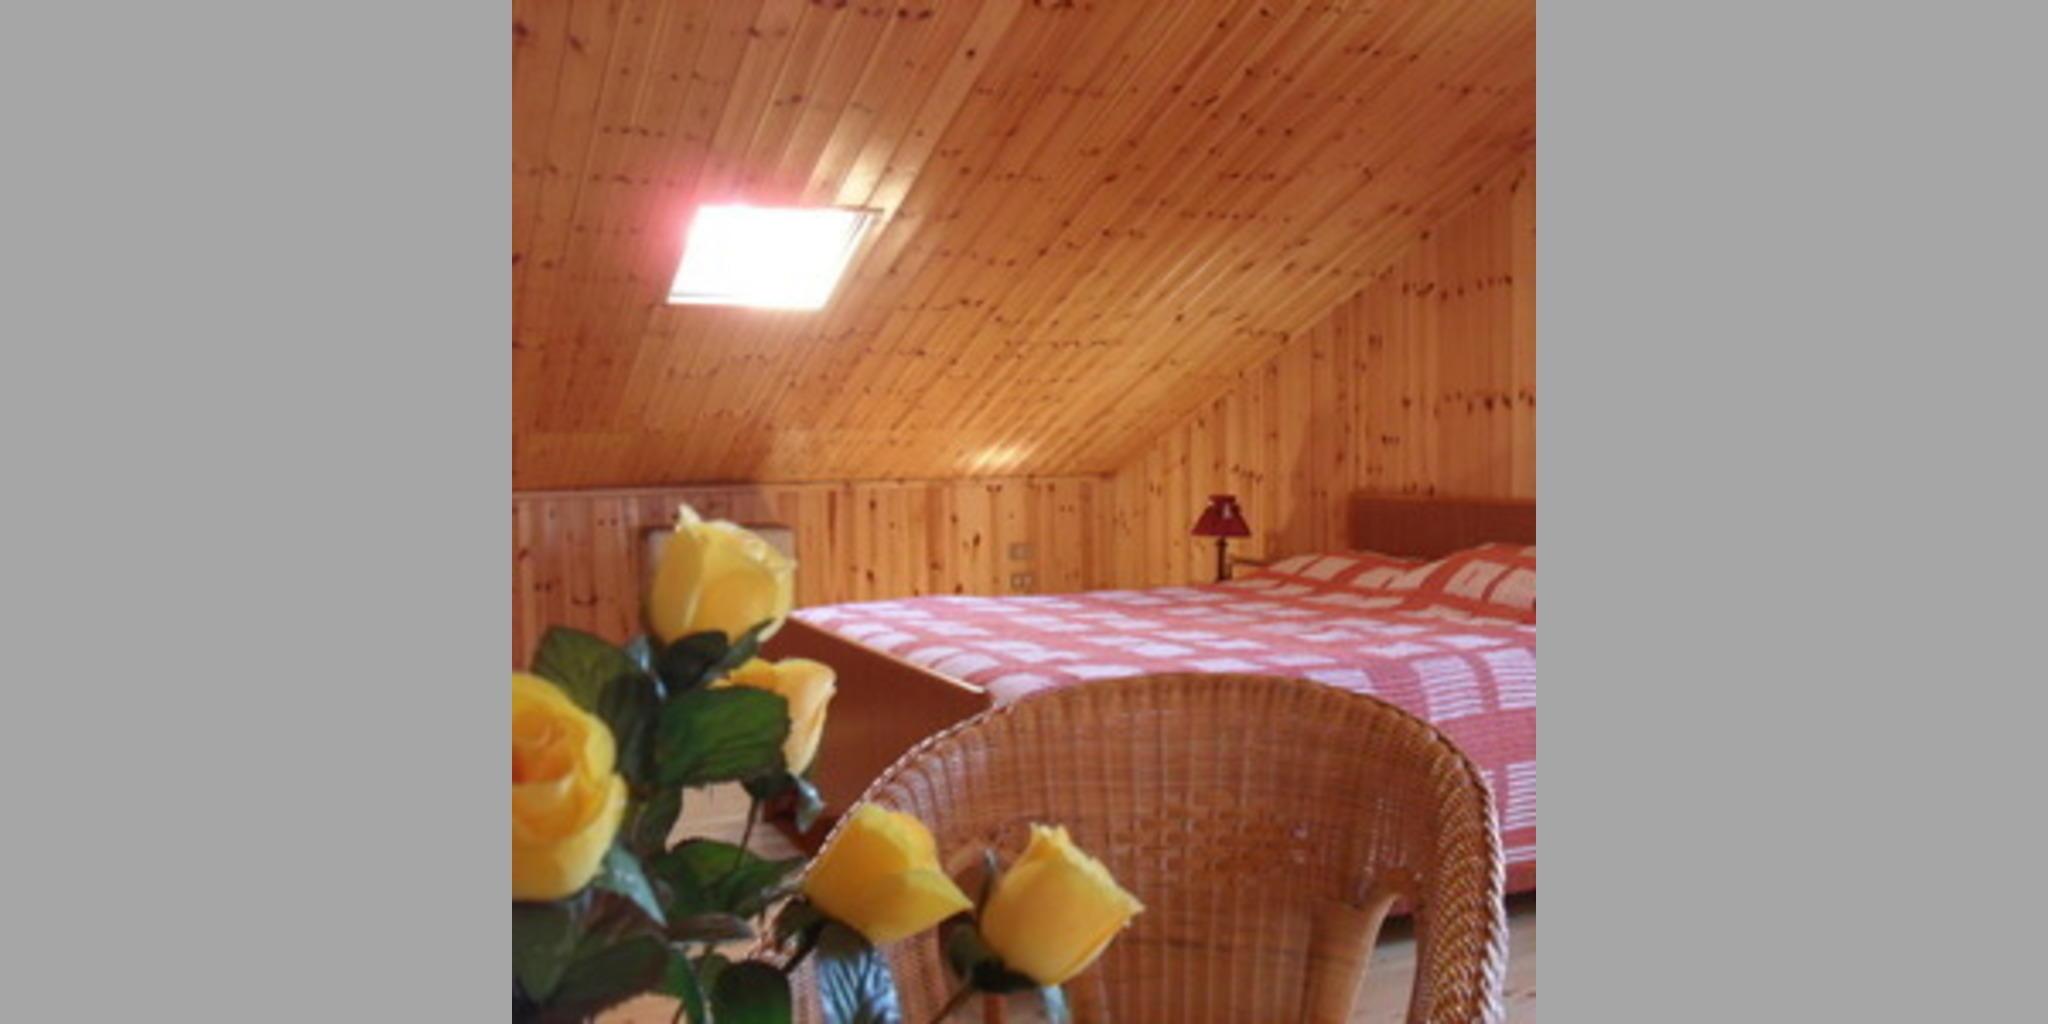 Bed & Breakfast Rotella - Capradosso